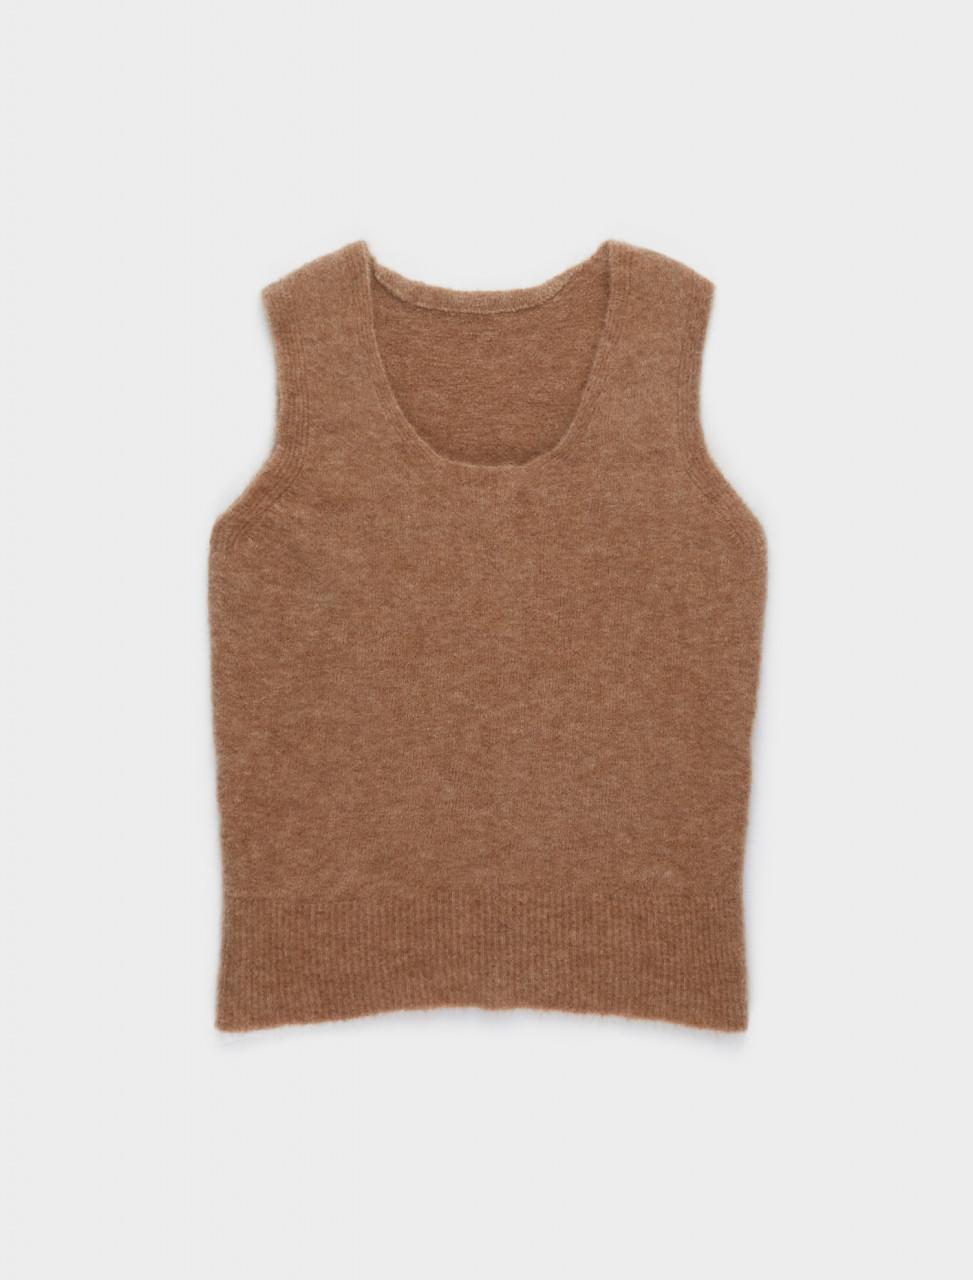 130-JSPR751054-WRY19028-257 JIL SANDER Sleeveles Knitted Top in Dark Beige